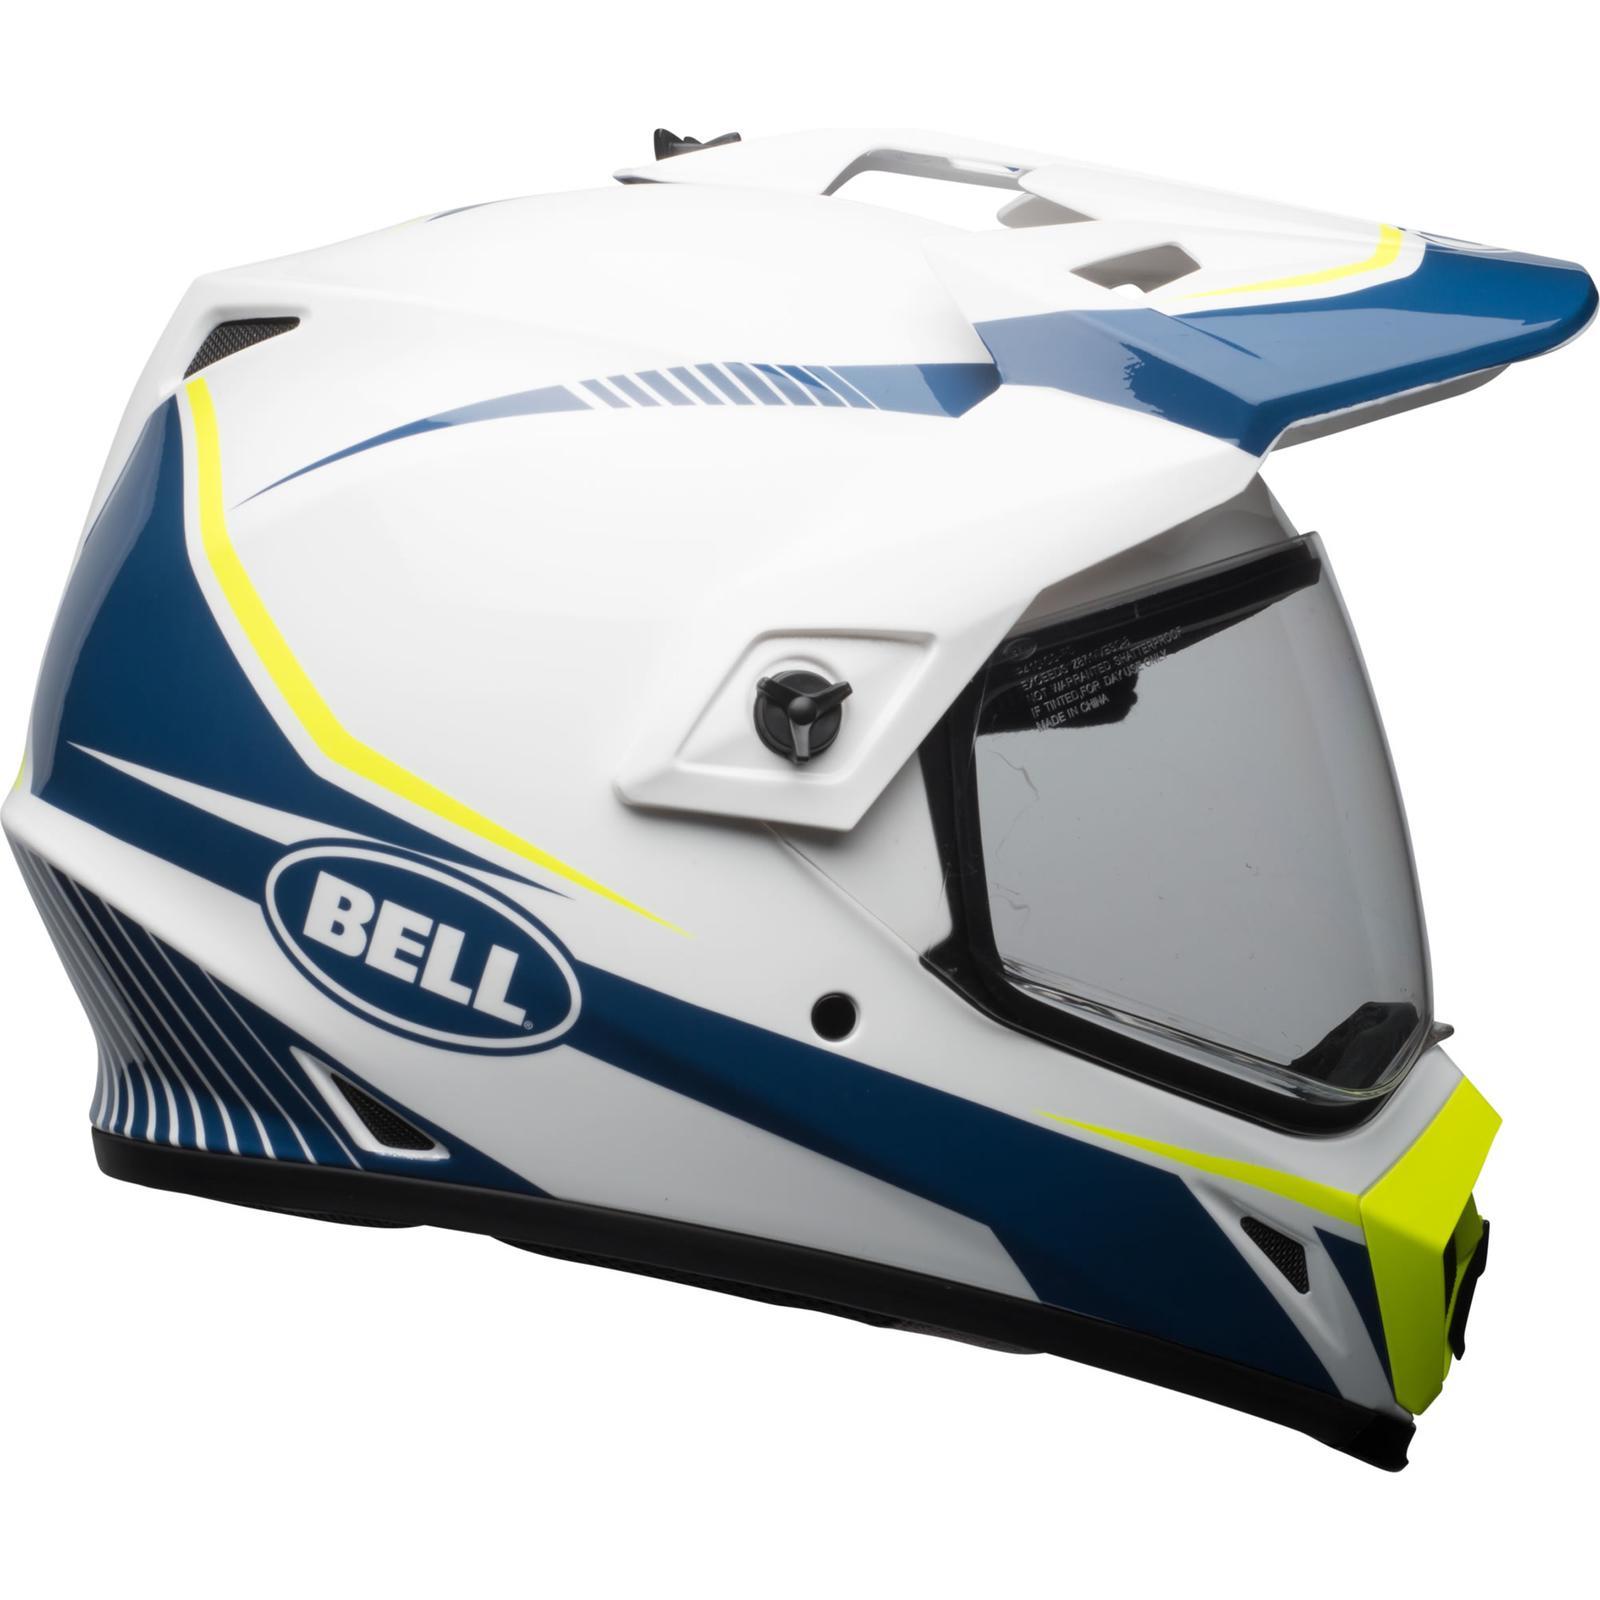 Bell Dual Sport Helmet >> Bell Mx 9 Adventure Mips Torch Dual Sport Helmet Visor Off Road